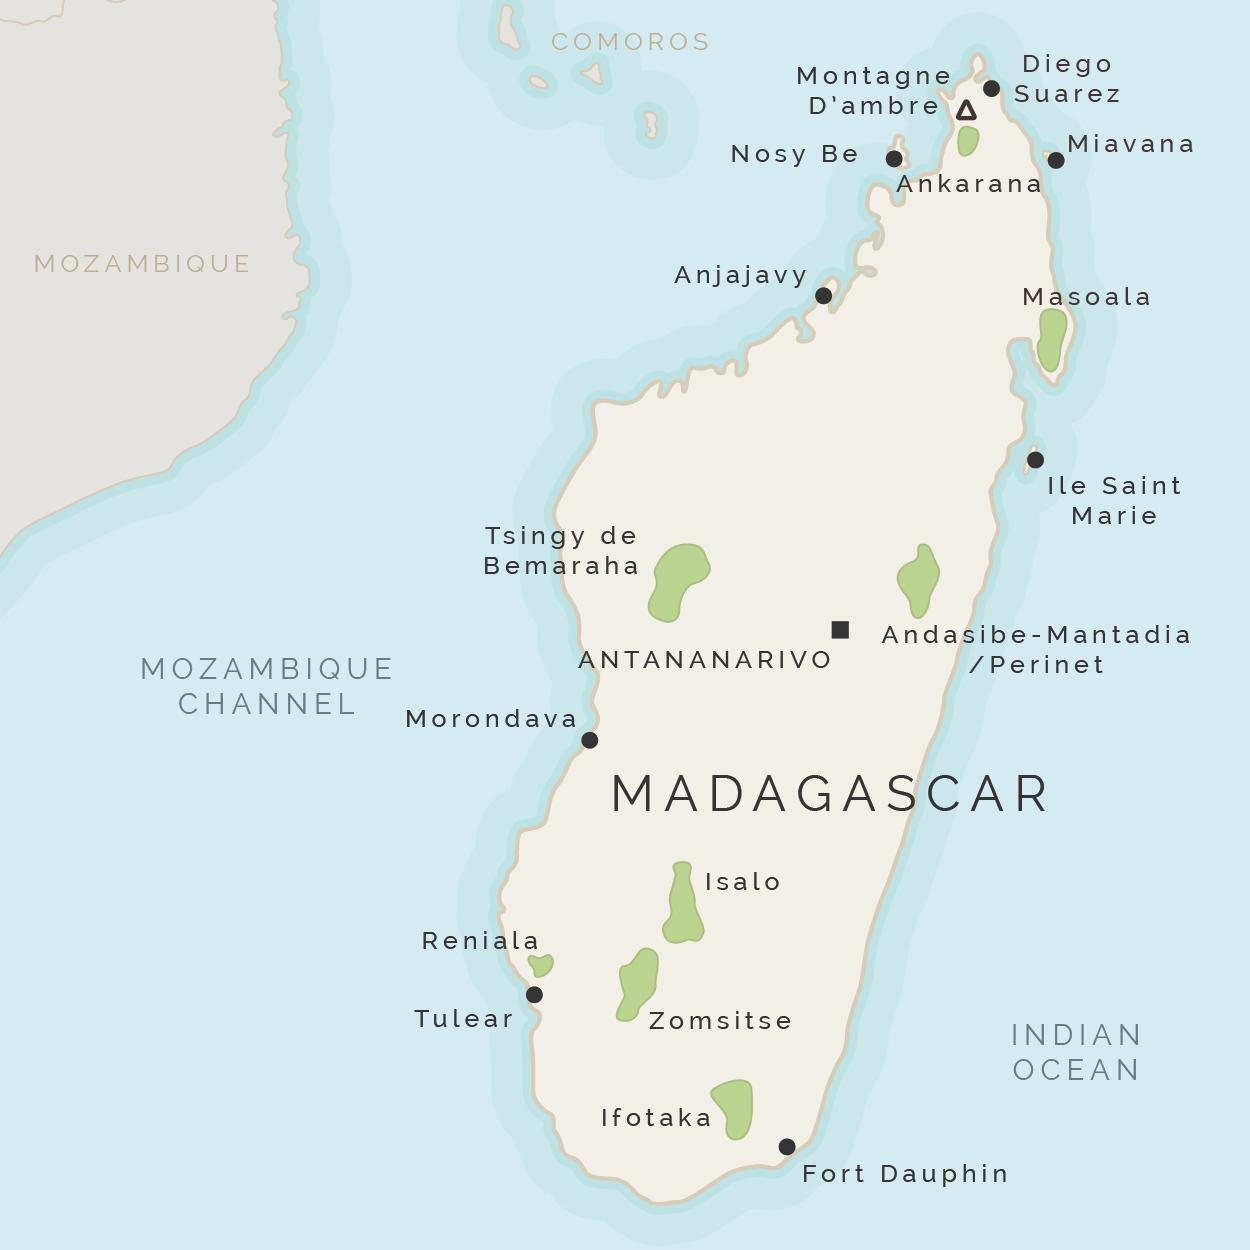 Madagaskar Karte.Madagaskar Insel Map Karte Von Madagaskar Und Umliegenden